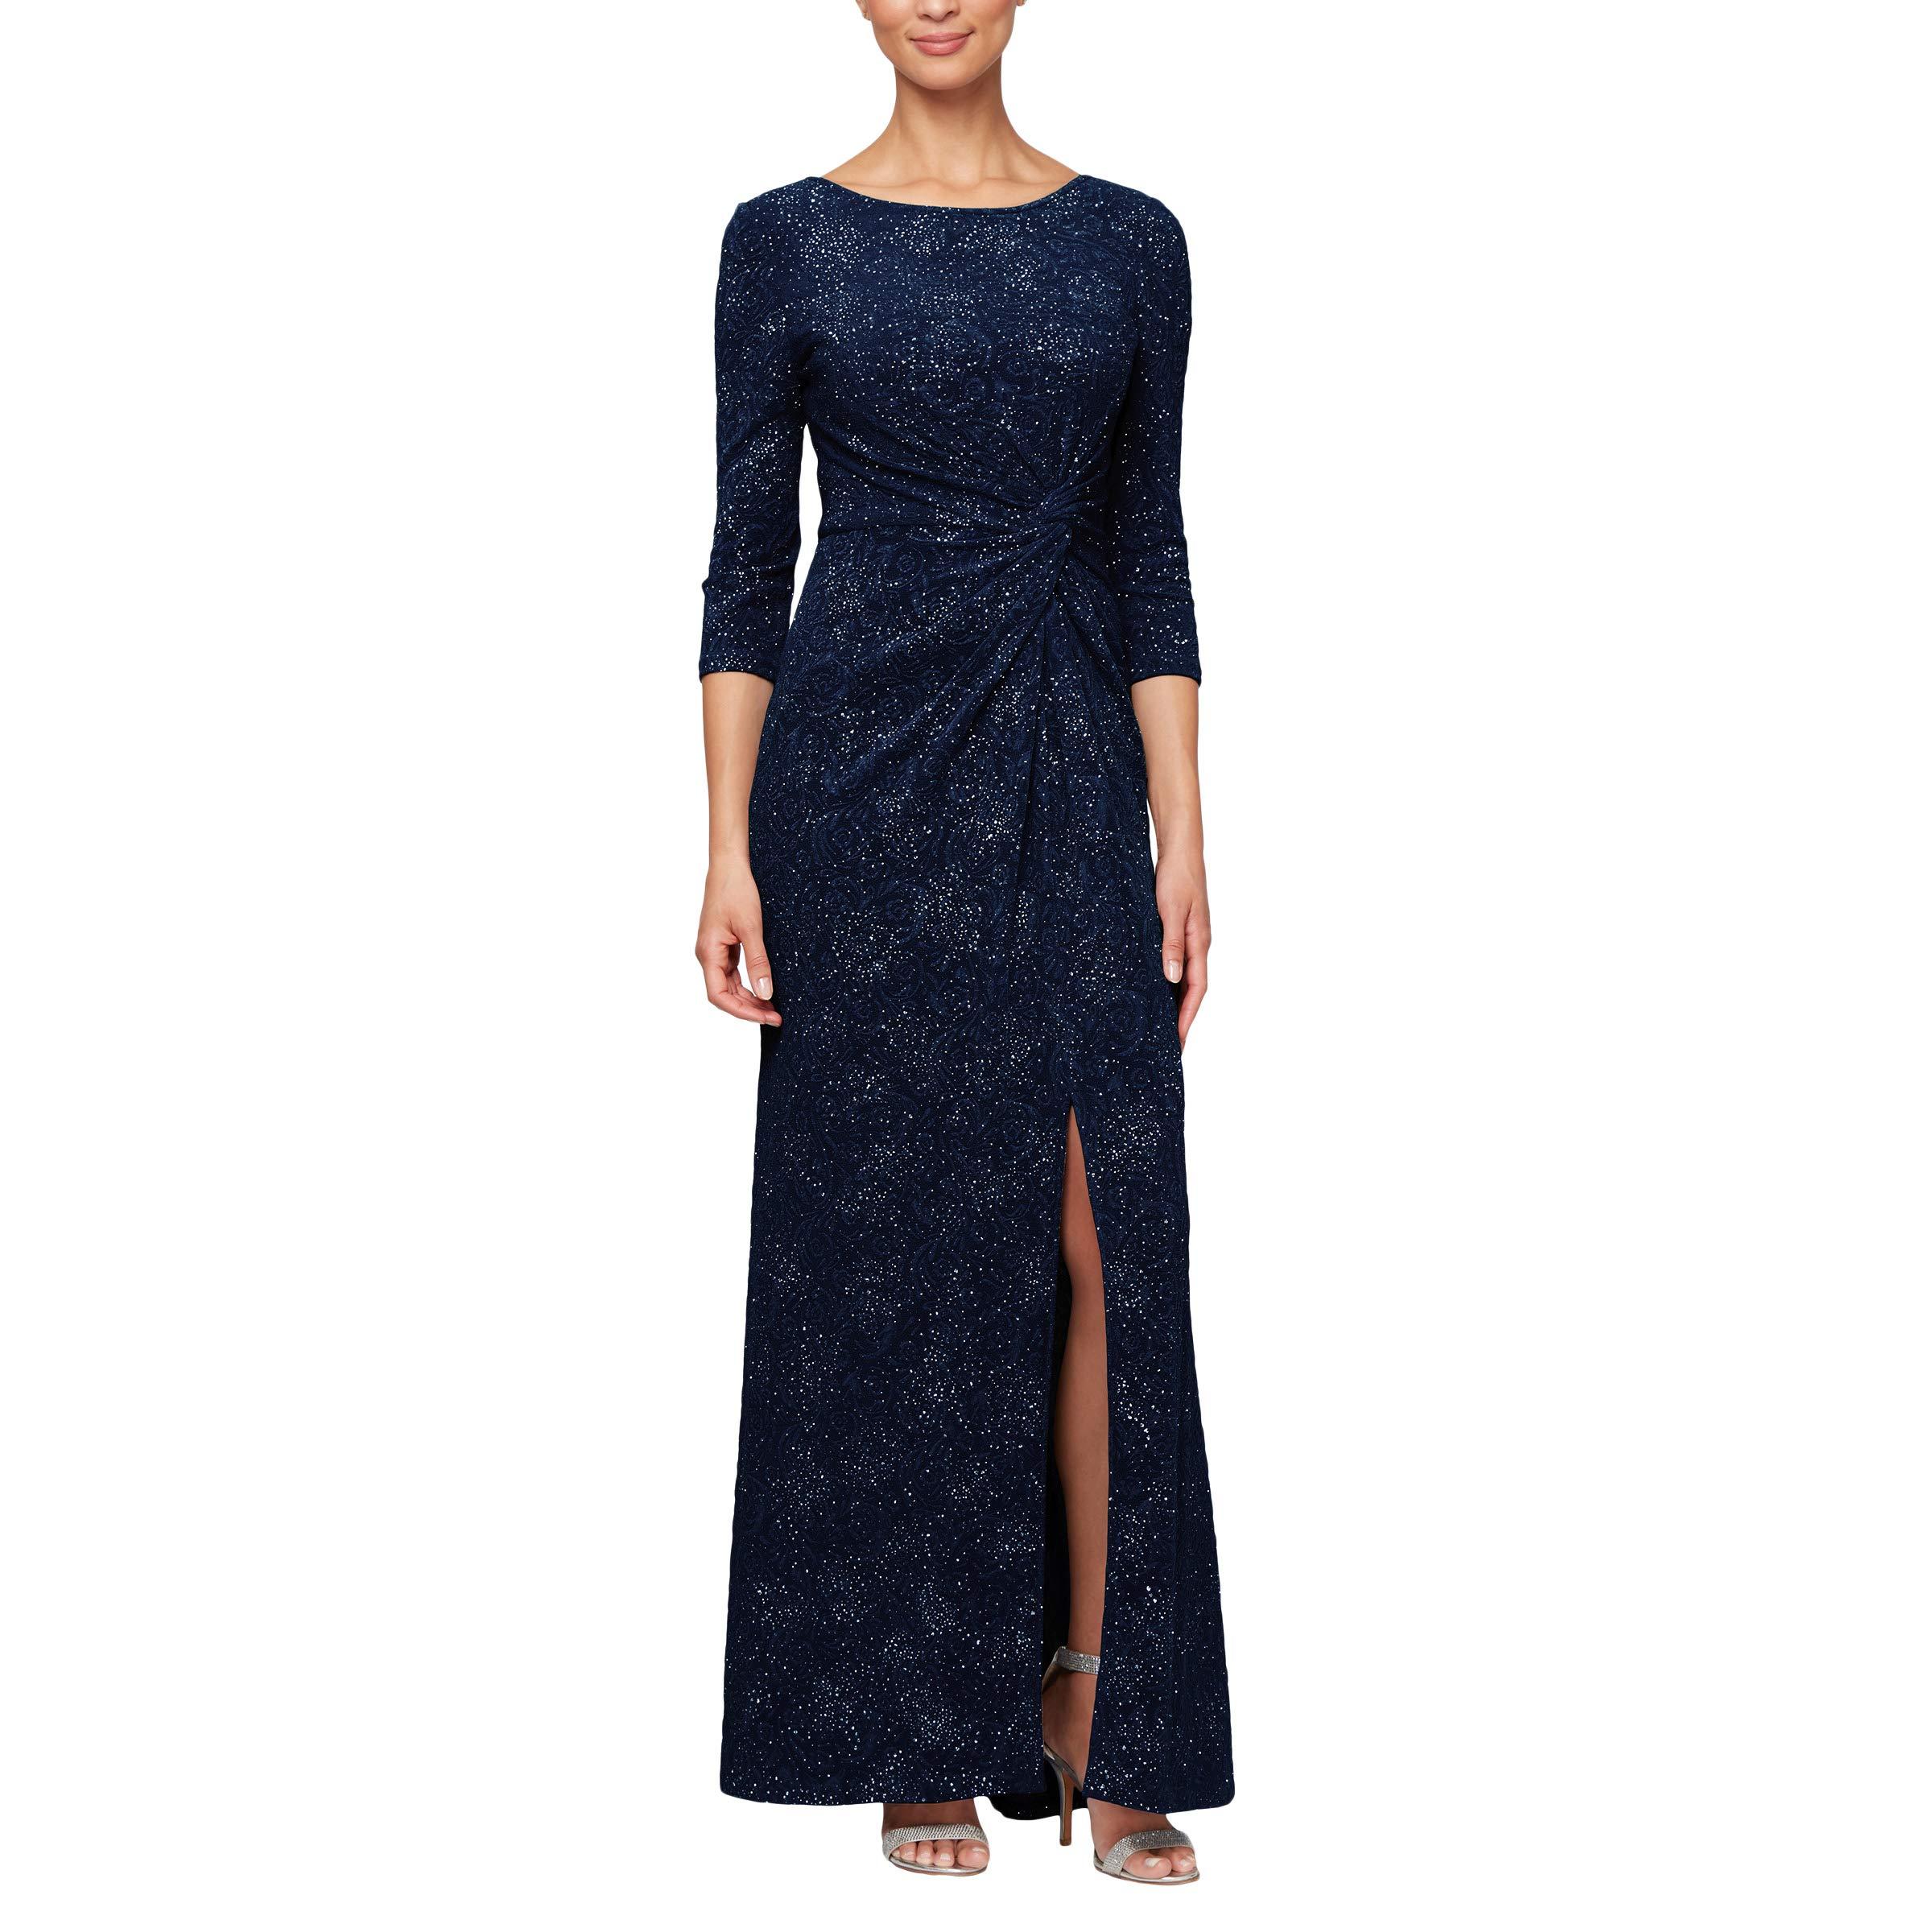 Petite plus womens evening dresses — img 3